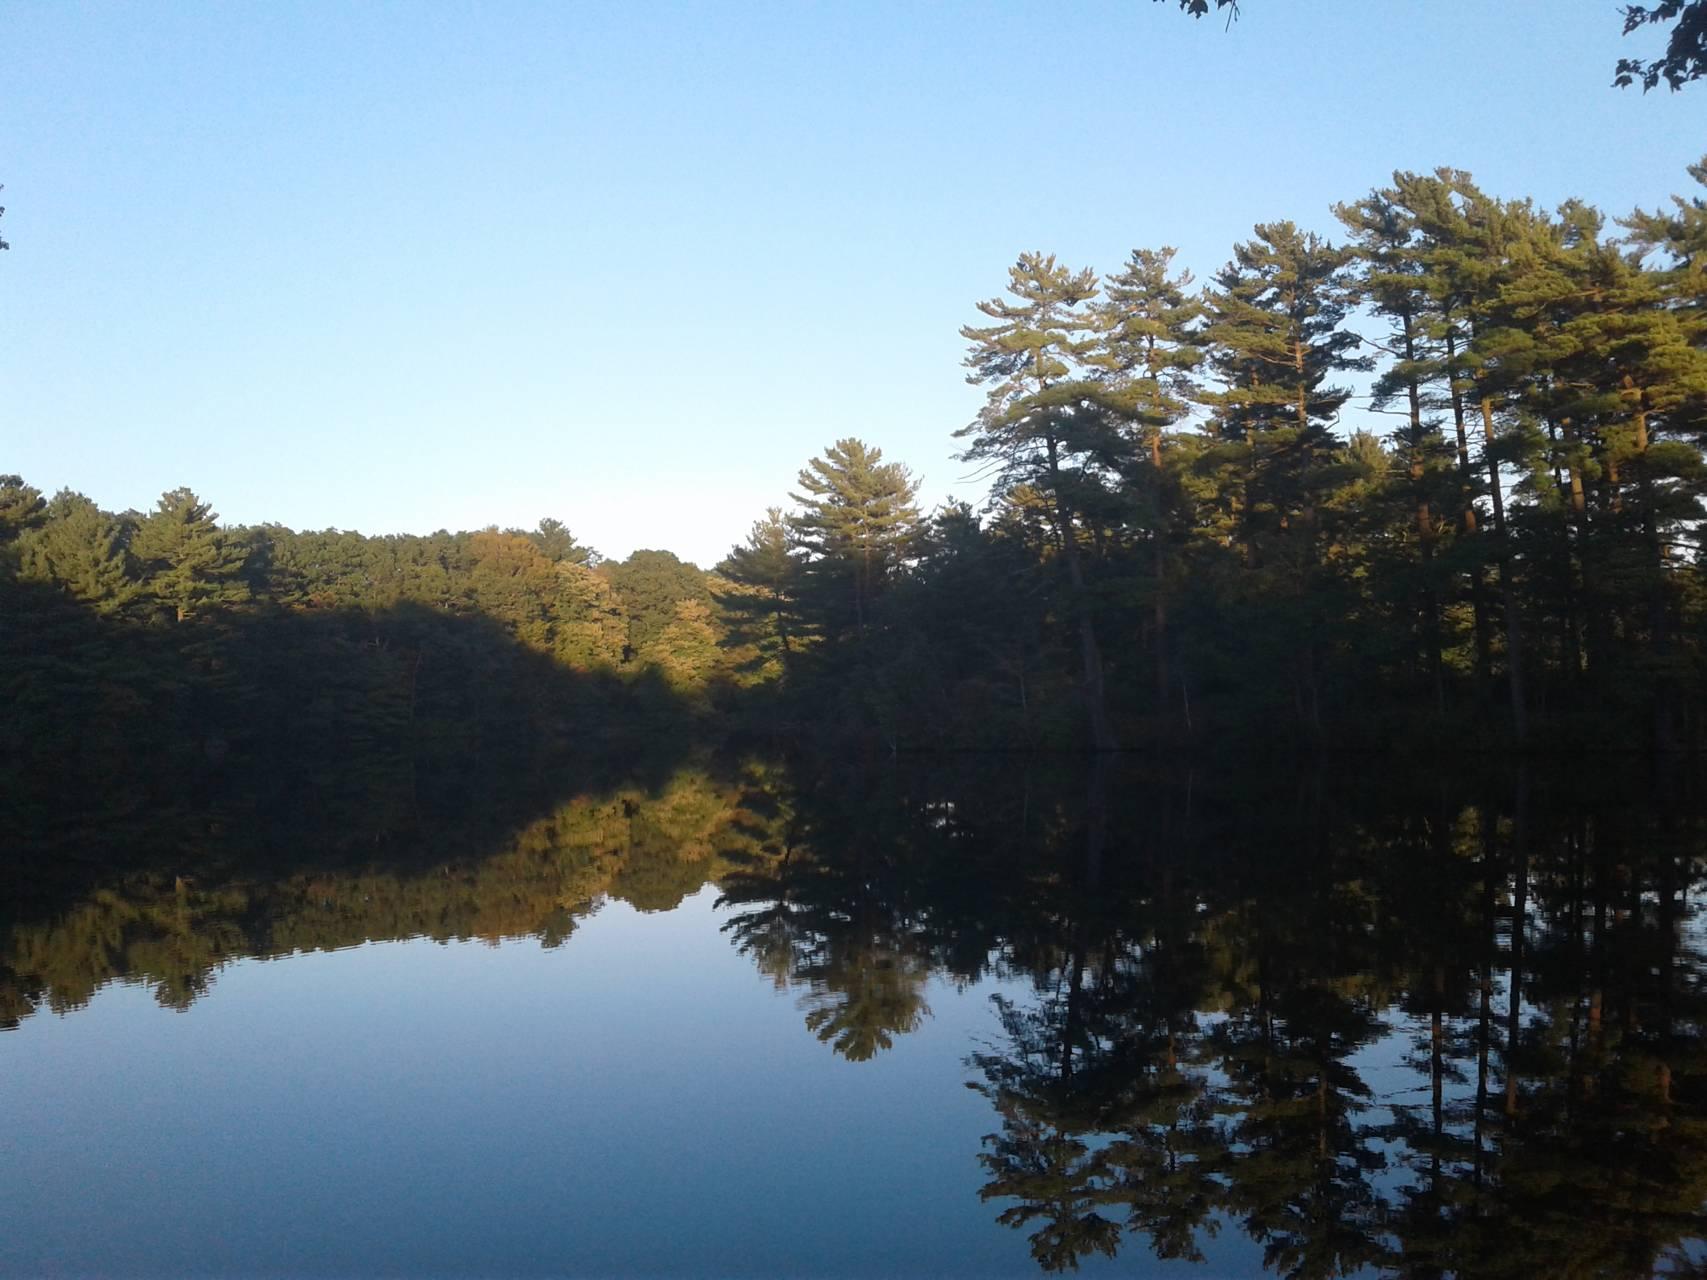 Lake of wisdom